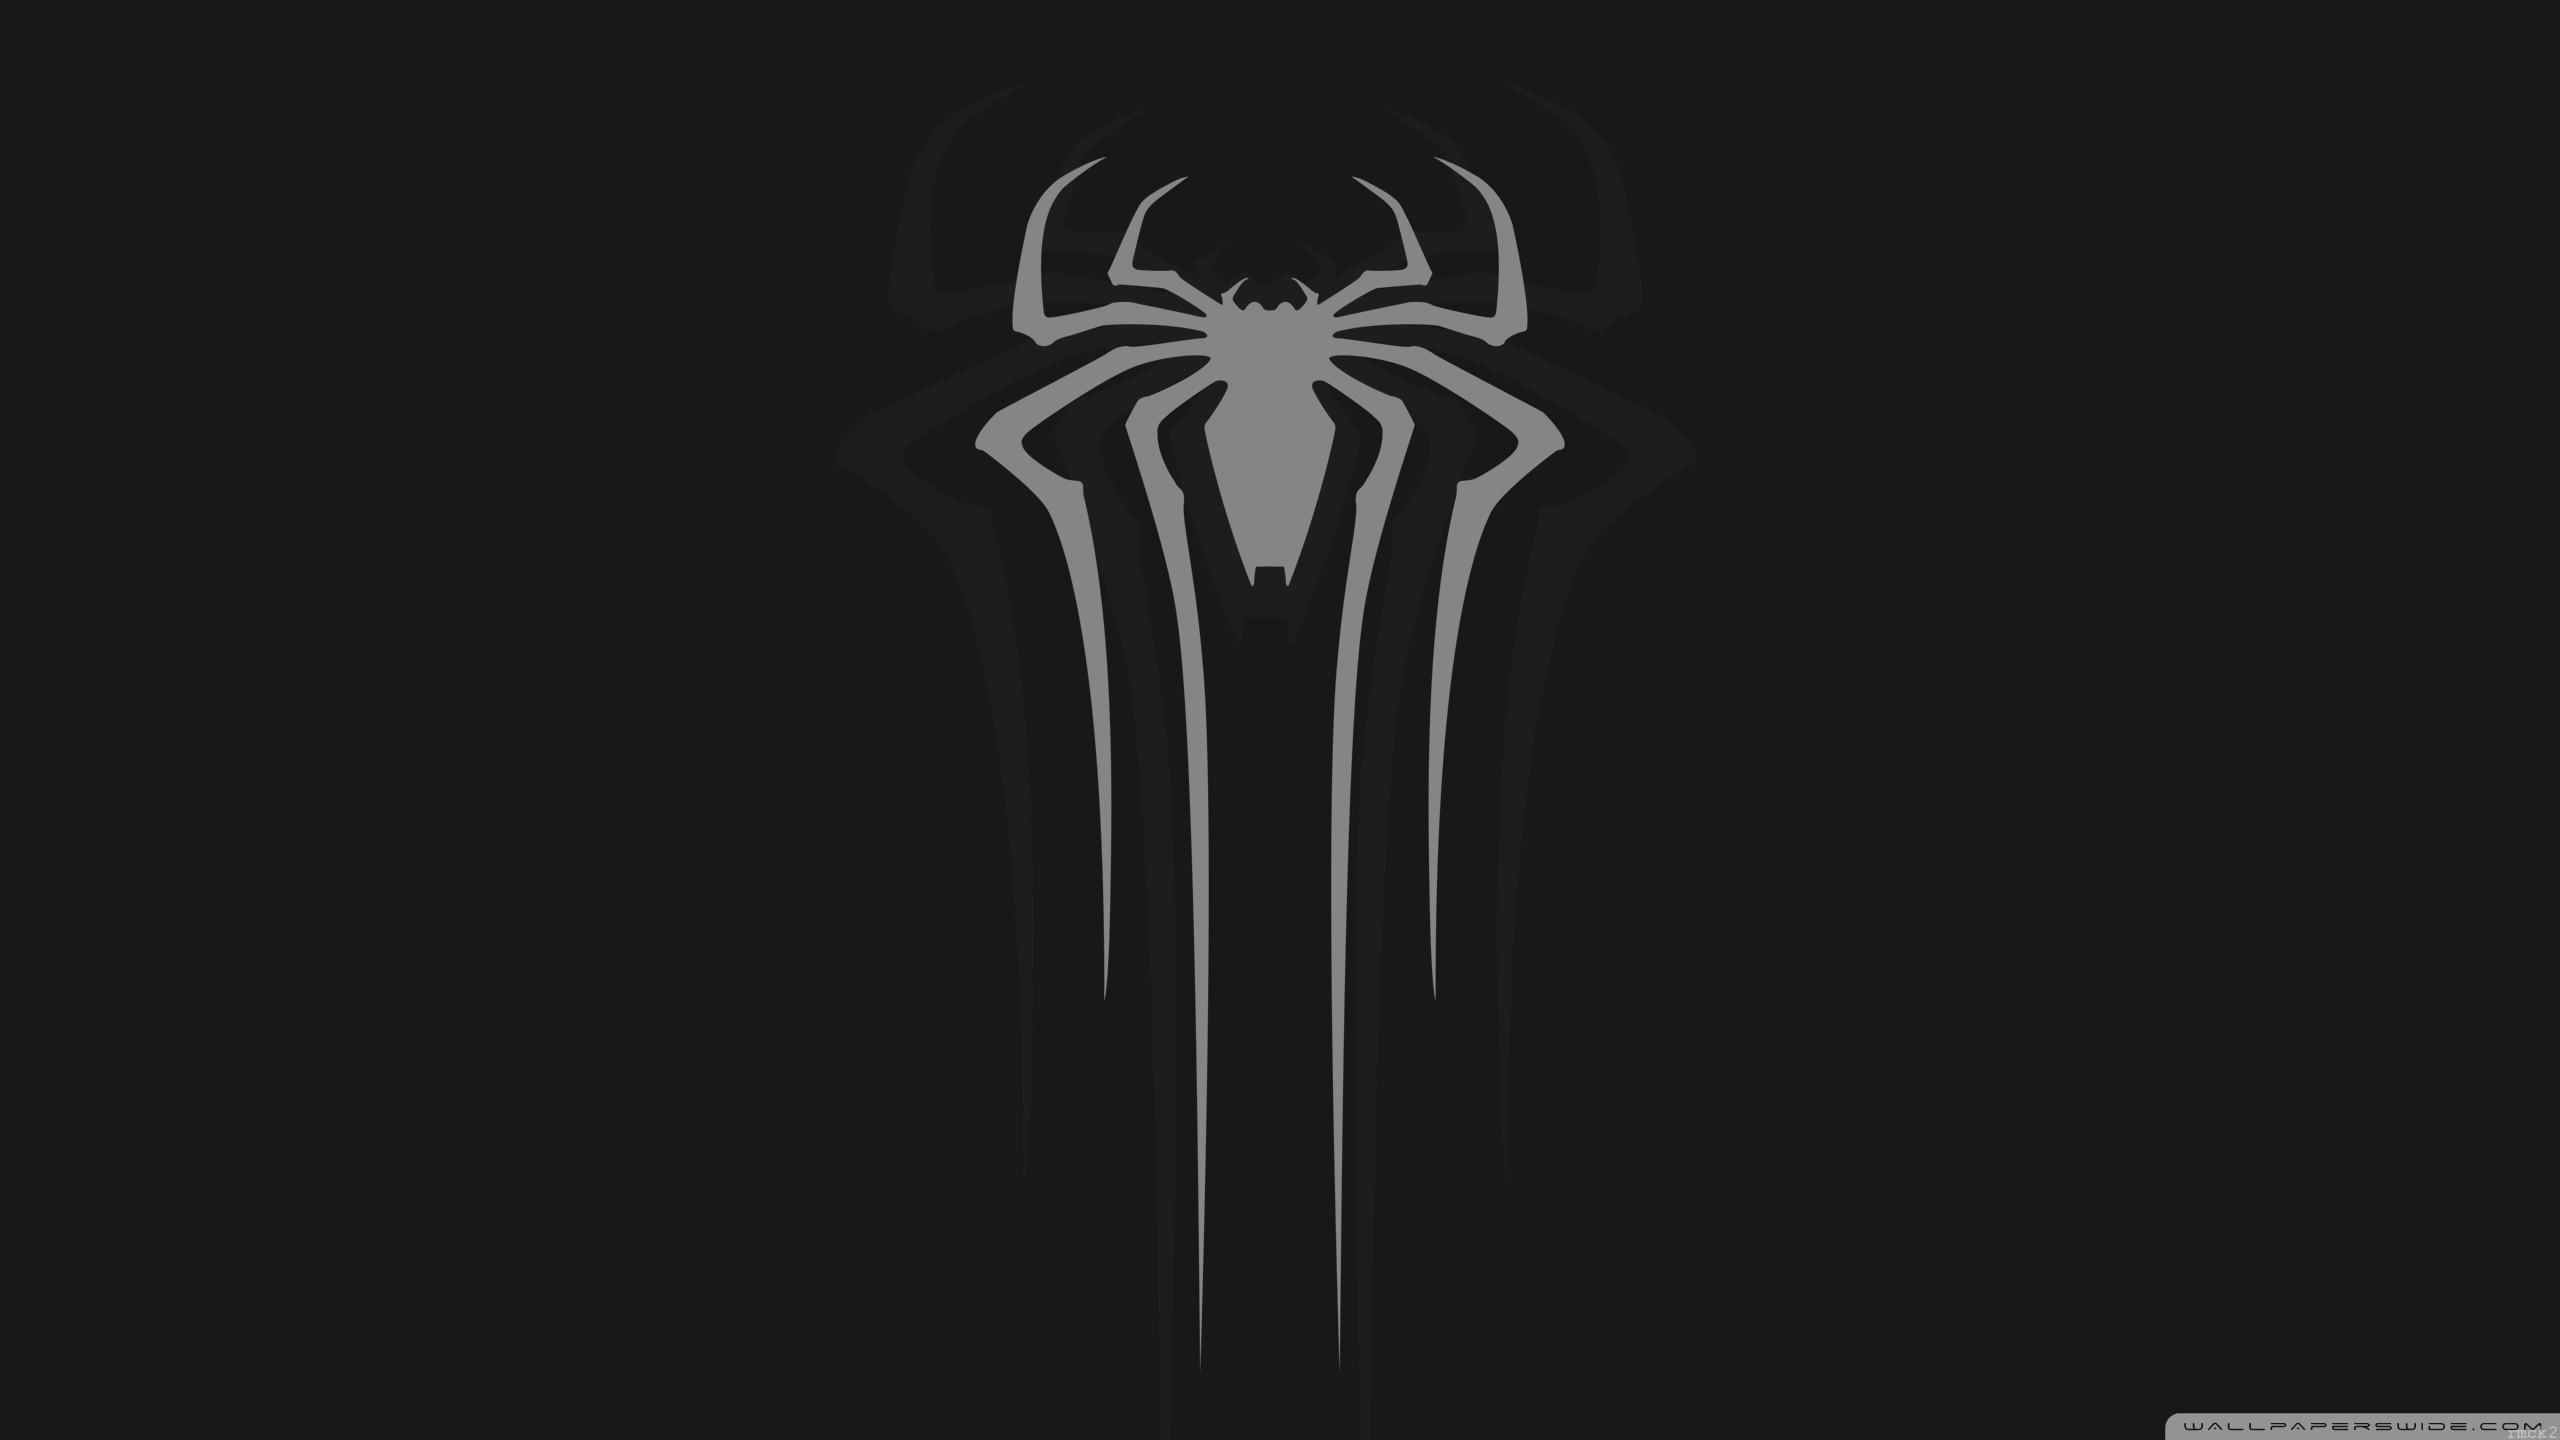 Res: 2560x1440, Spider-Man Wallpaper My New Spider-Man Wallpaper! | Marvel .